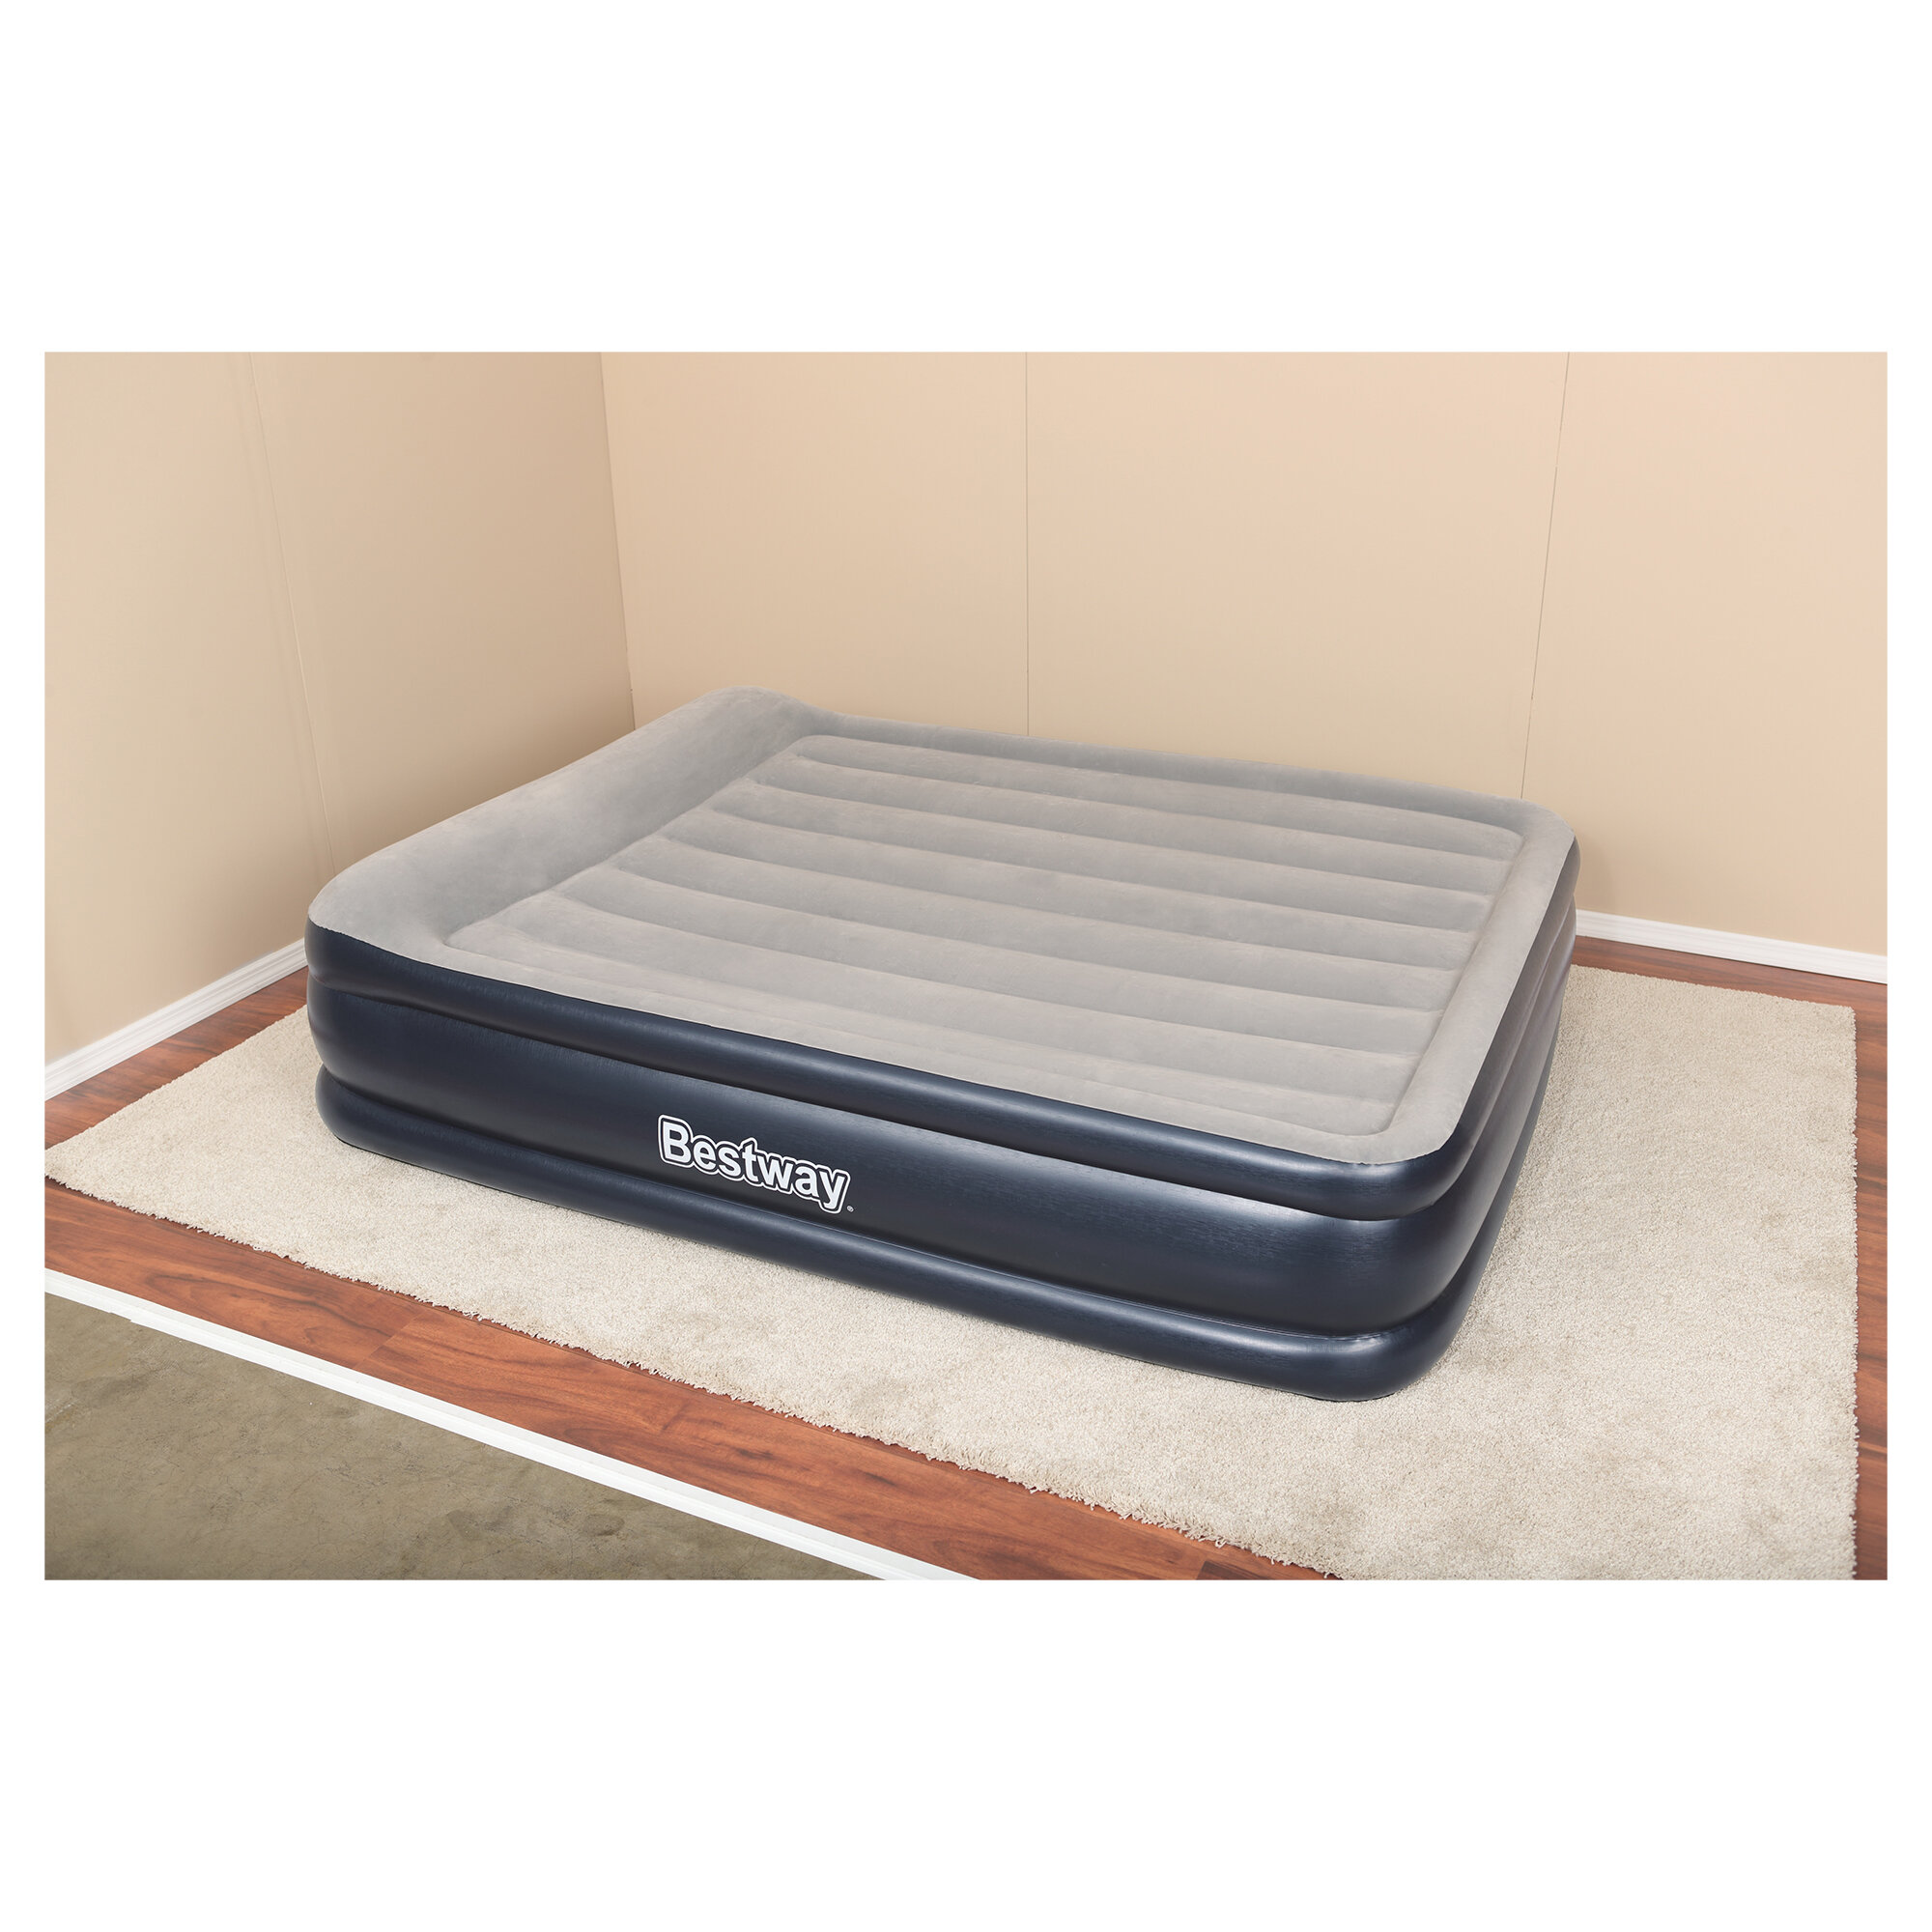 Bestway Tritech Highrise Queen Size Airbed Mattress Built-In Pump Luxury Air Bed